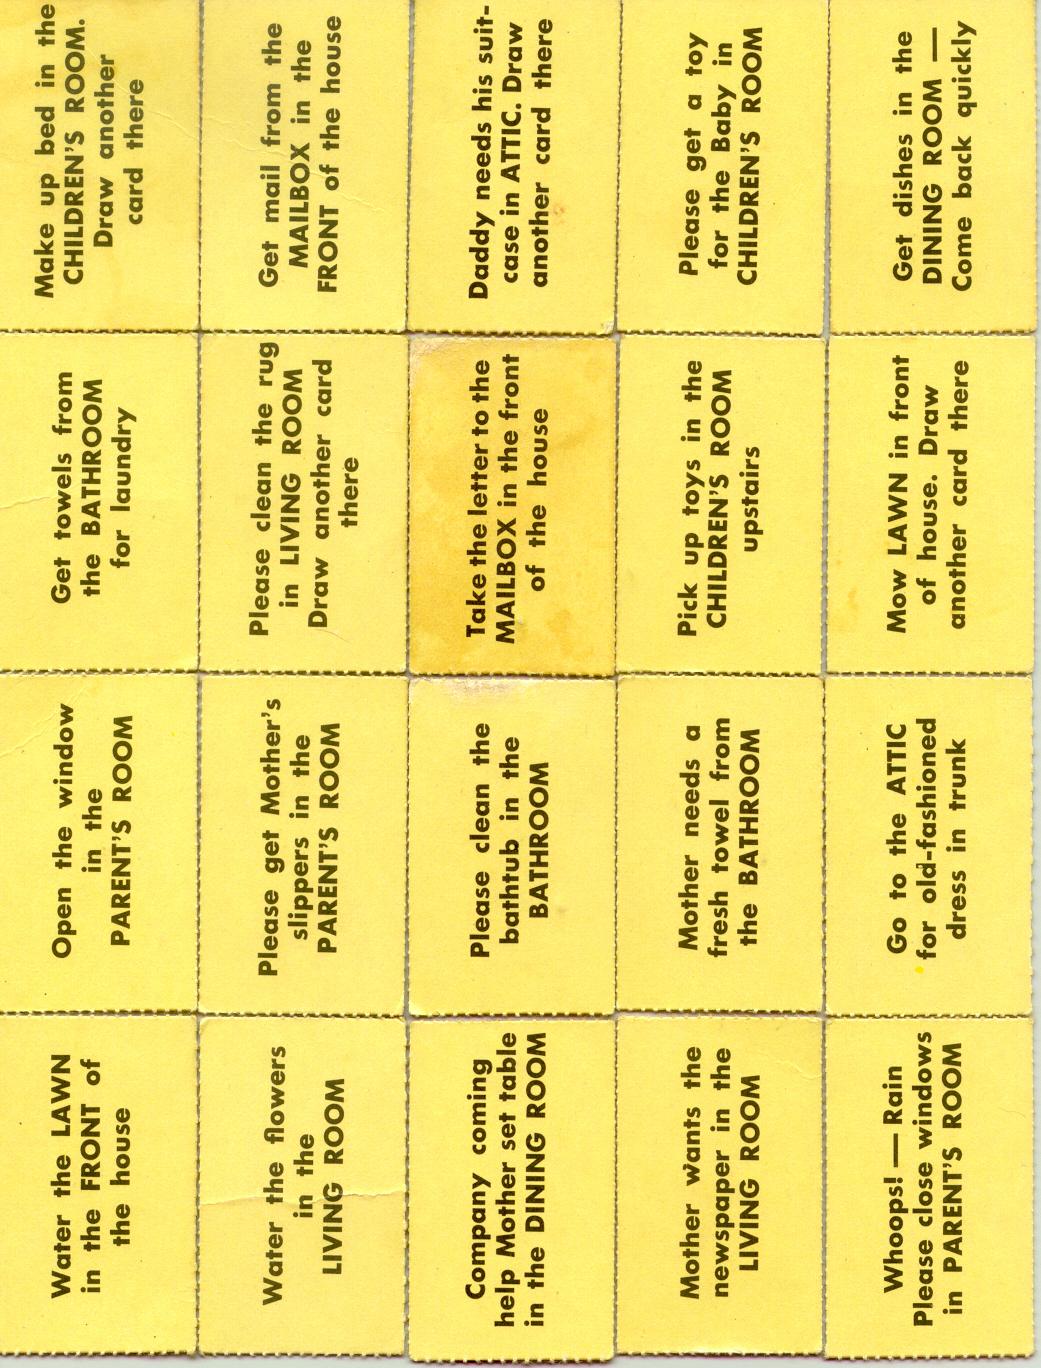 chore card template